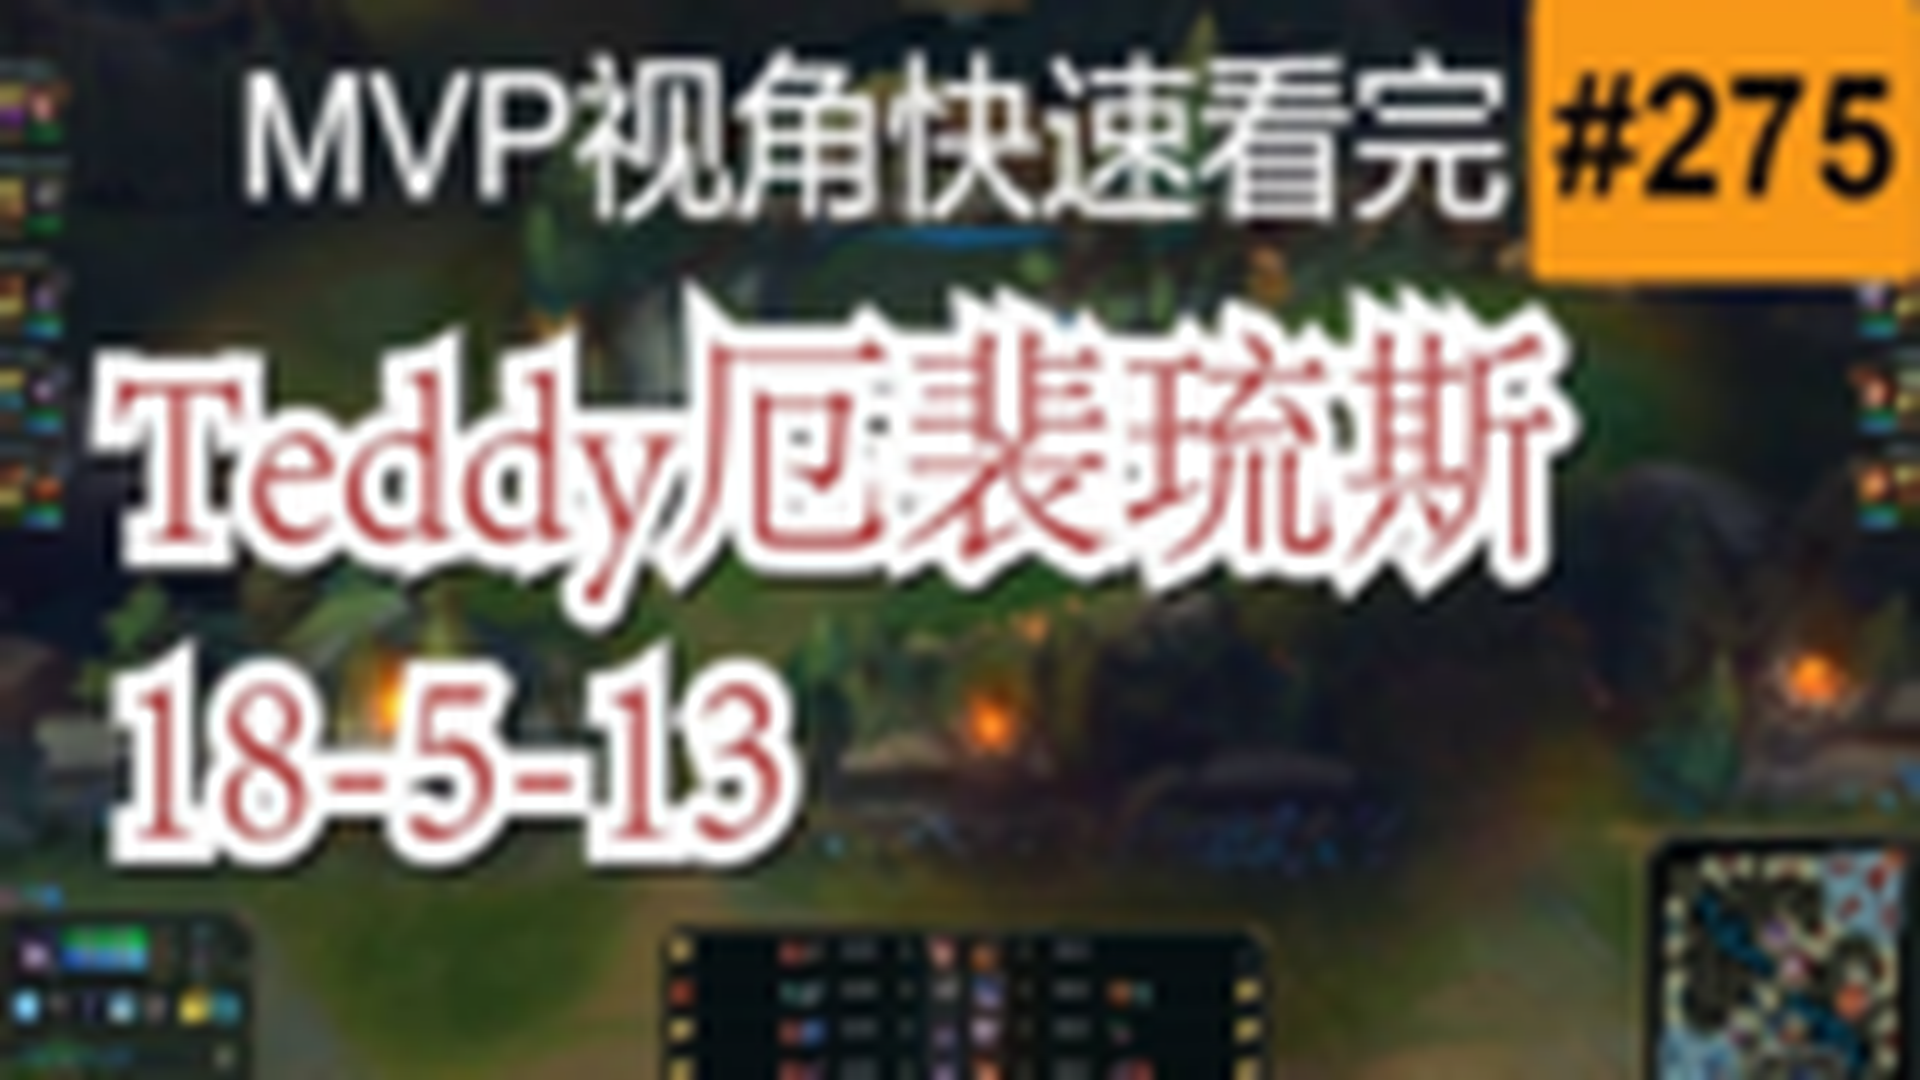 SKT.Teddy厄裴琉斯下路【MVP视角快速看完一局王者排位】#275